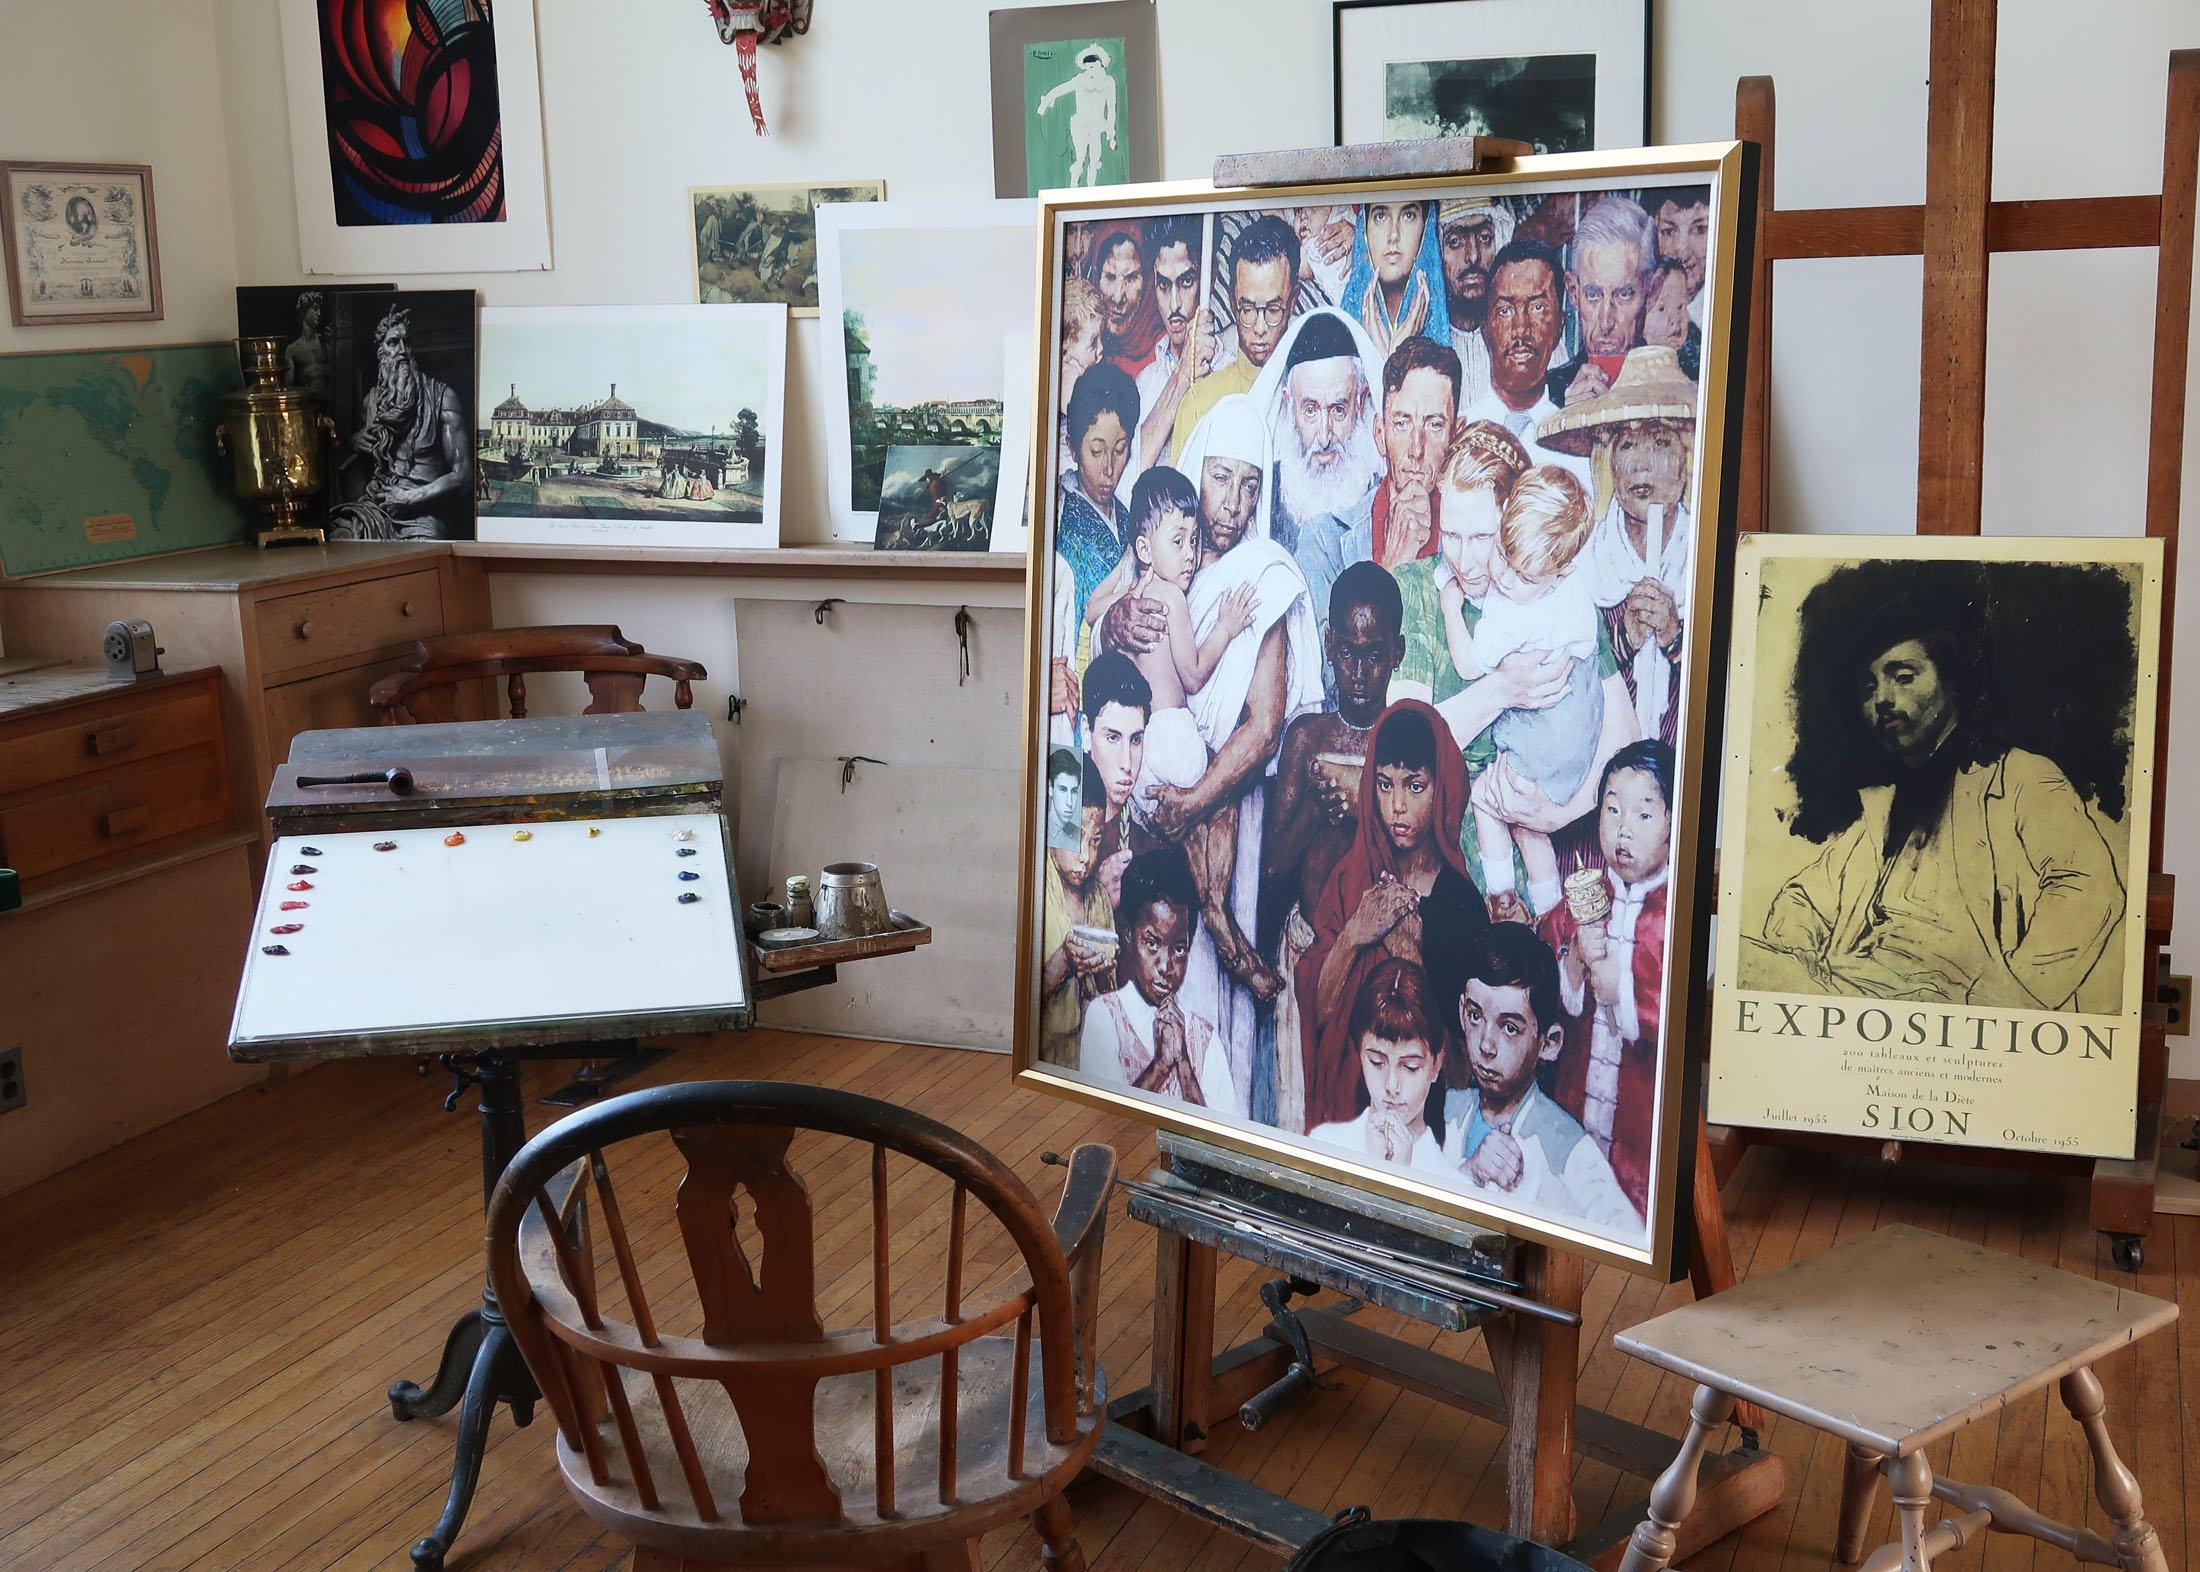 Norman Rockwell's studio in Stockbridge, Mass., where he lived for 25 years. (Craig Davis/Craigslegztravels.com)